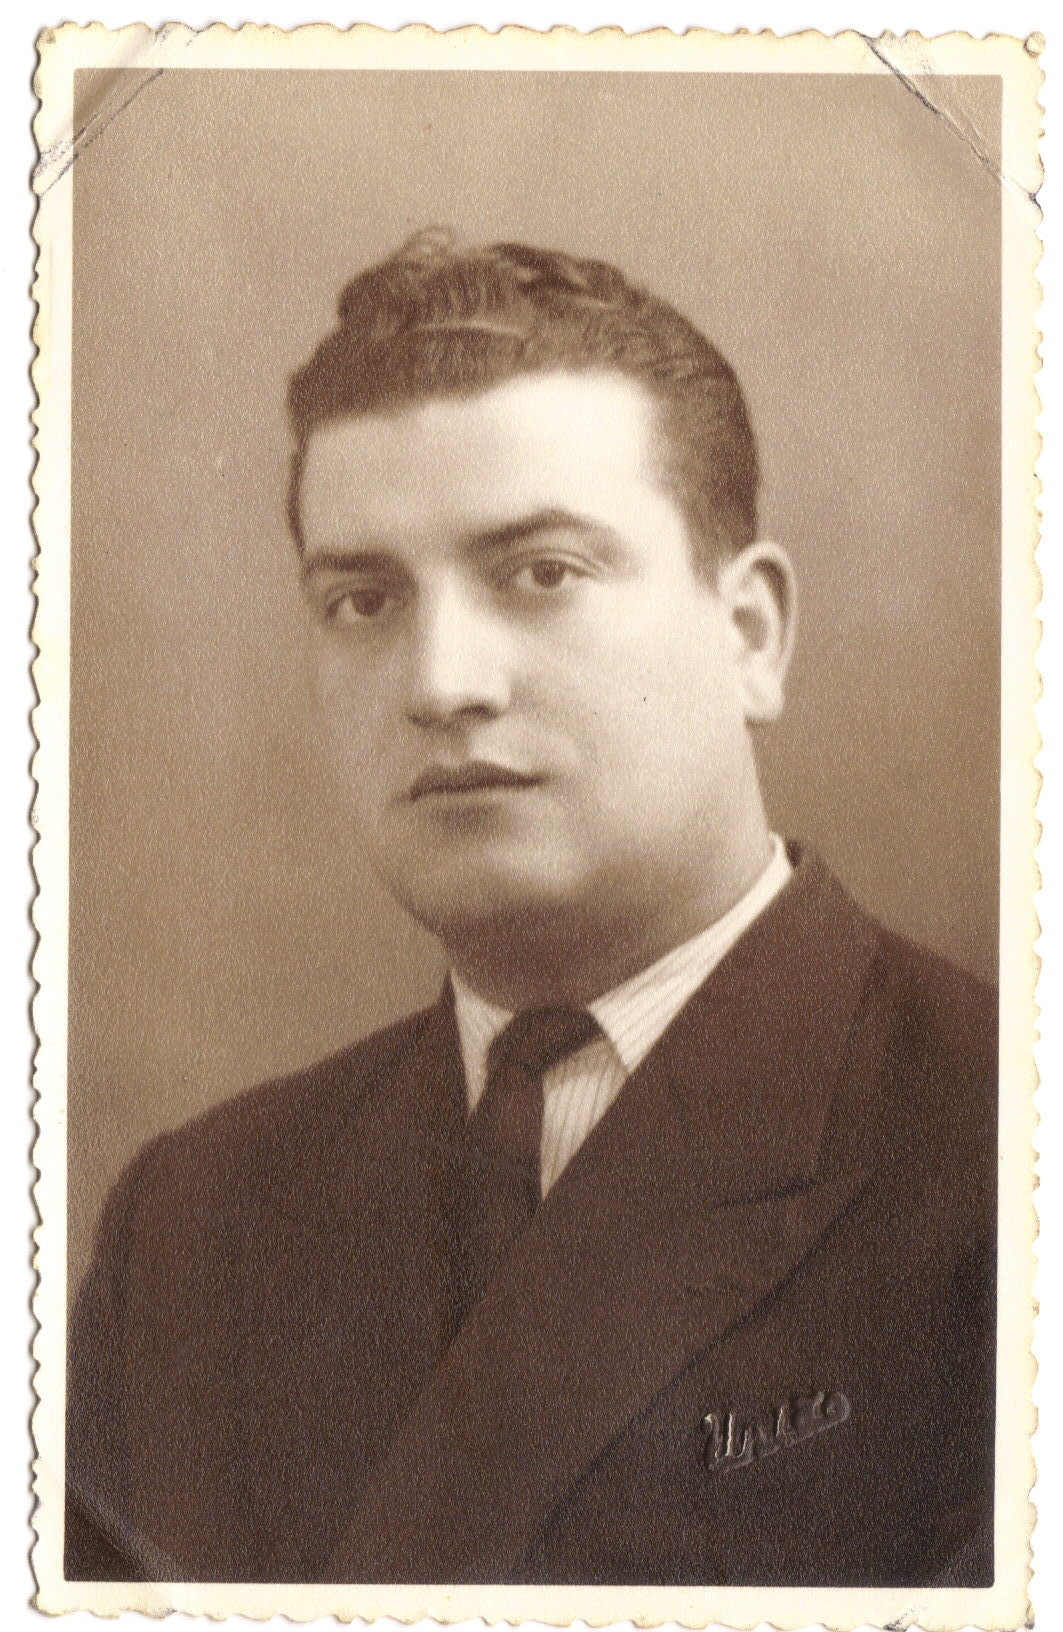 José Augusto Pimenta em idade adulta